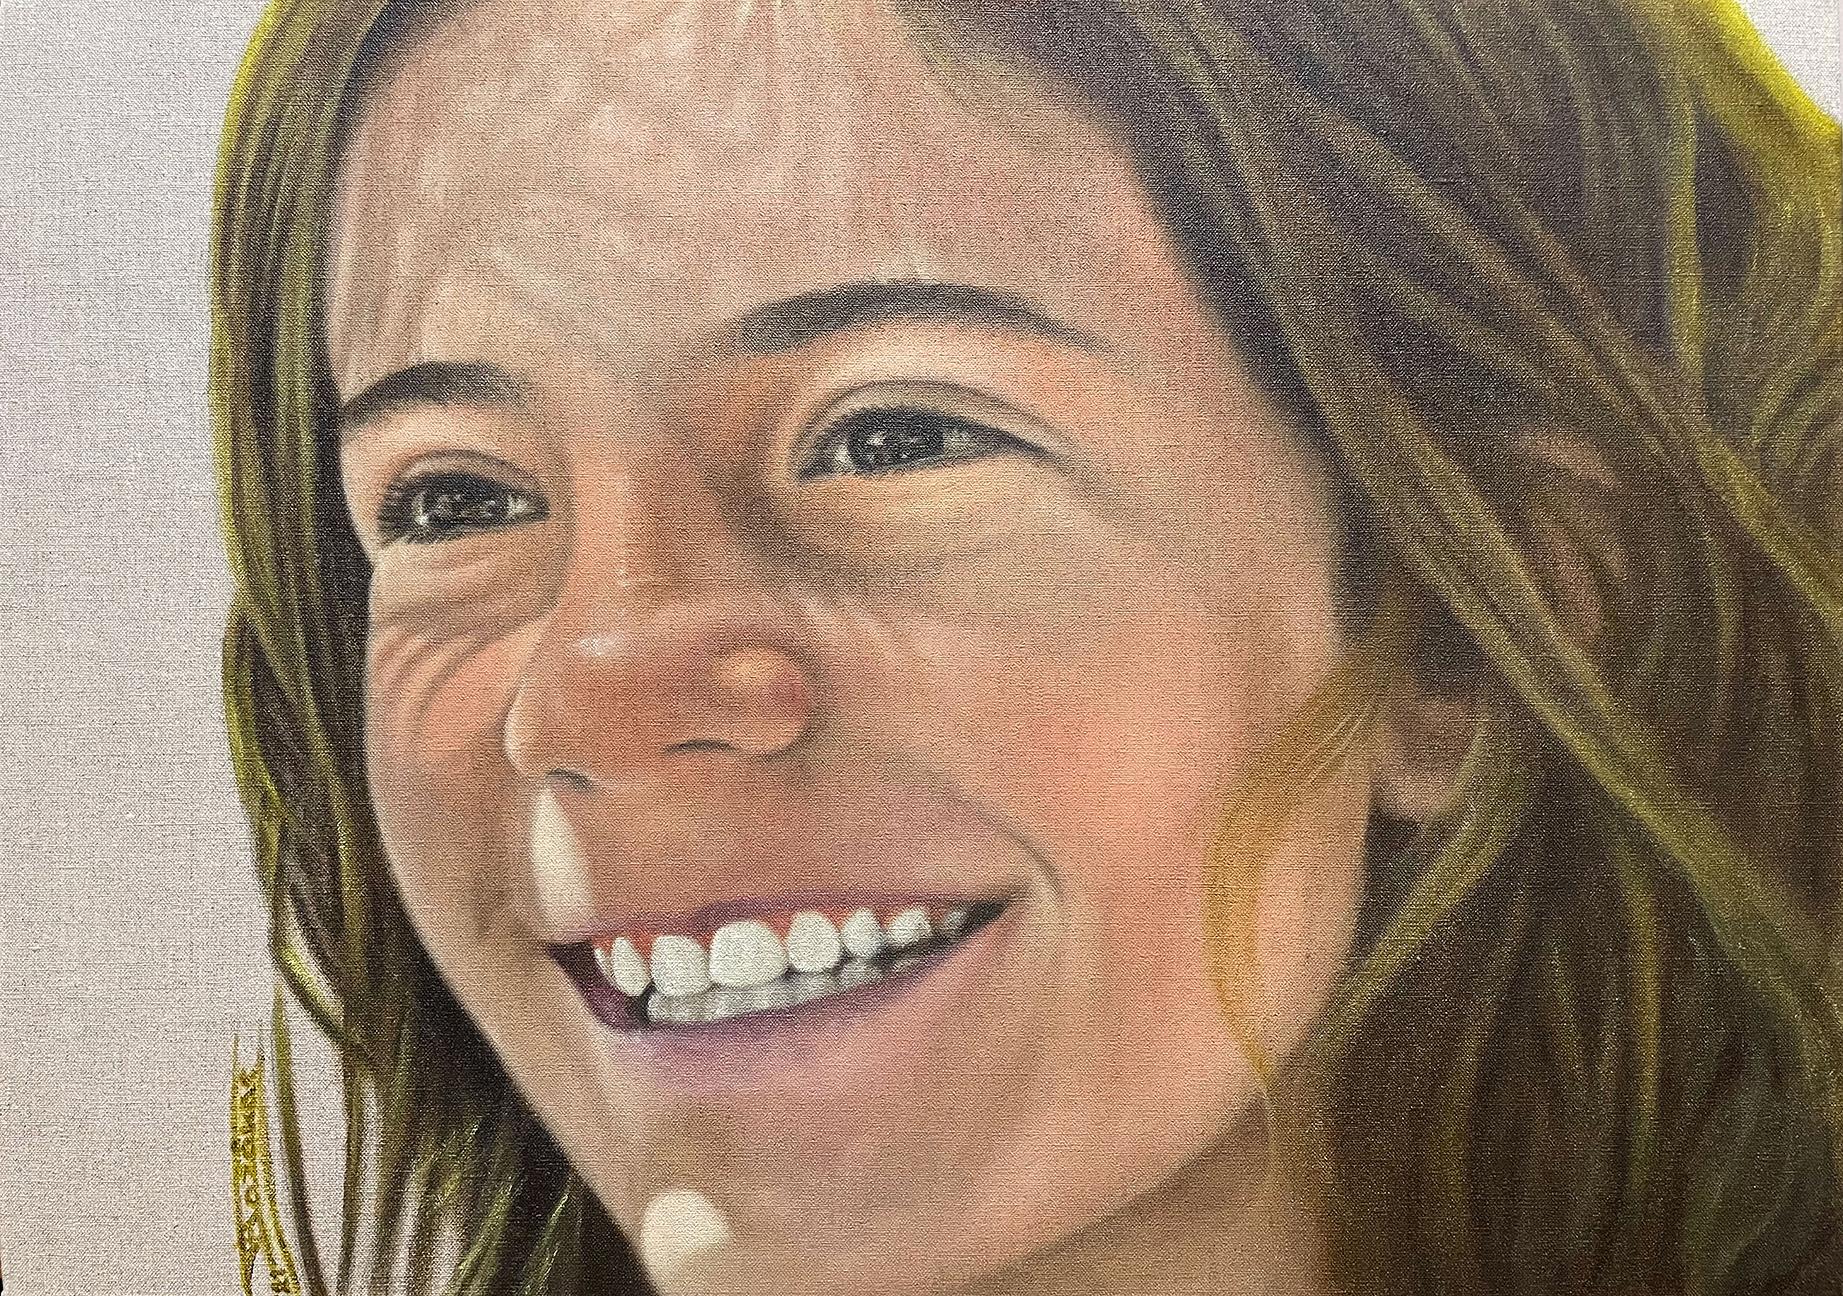 """Elli"" (65x46)cm, Oil on linen canvas, 2021 - Private collection"